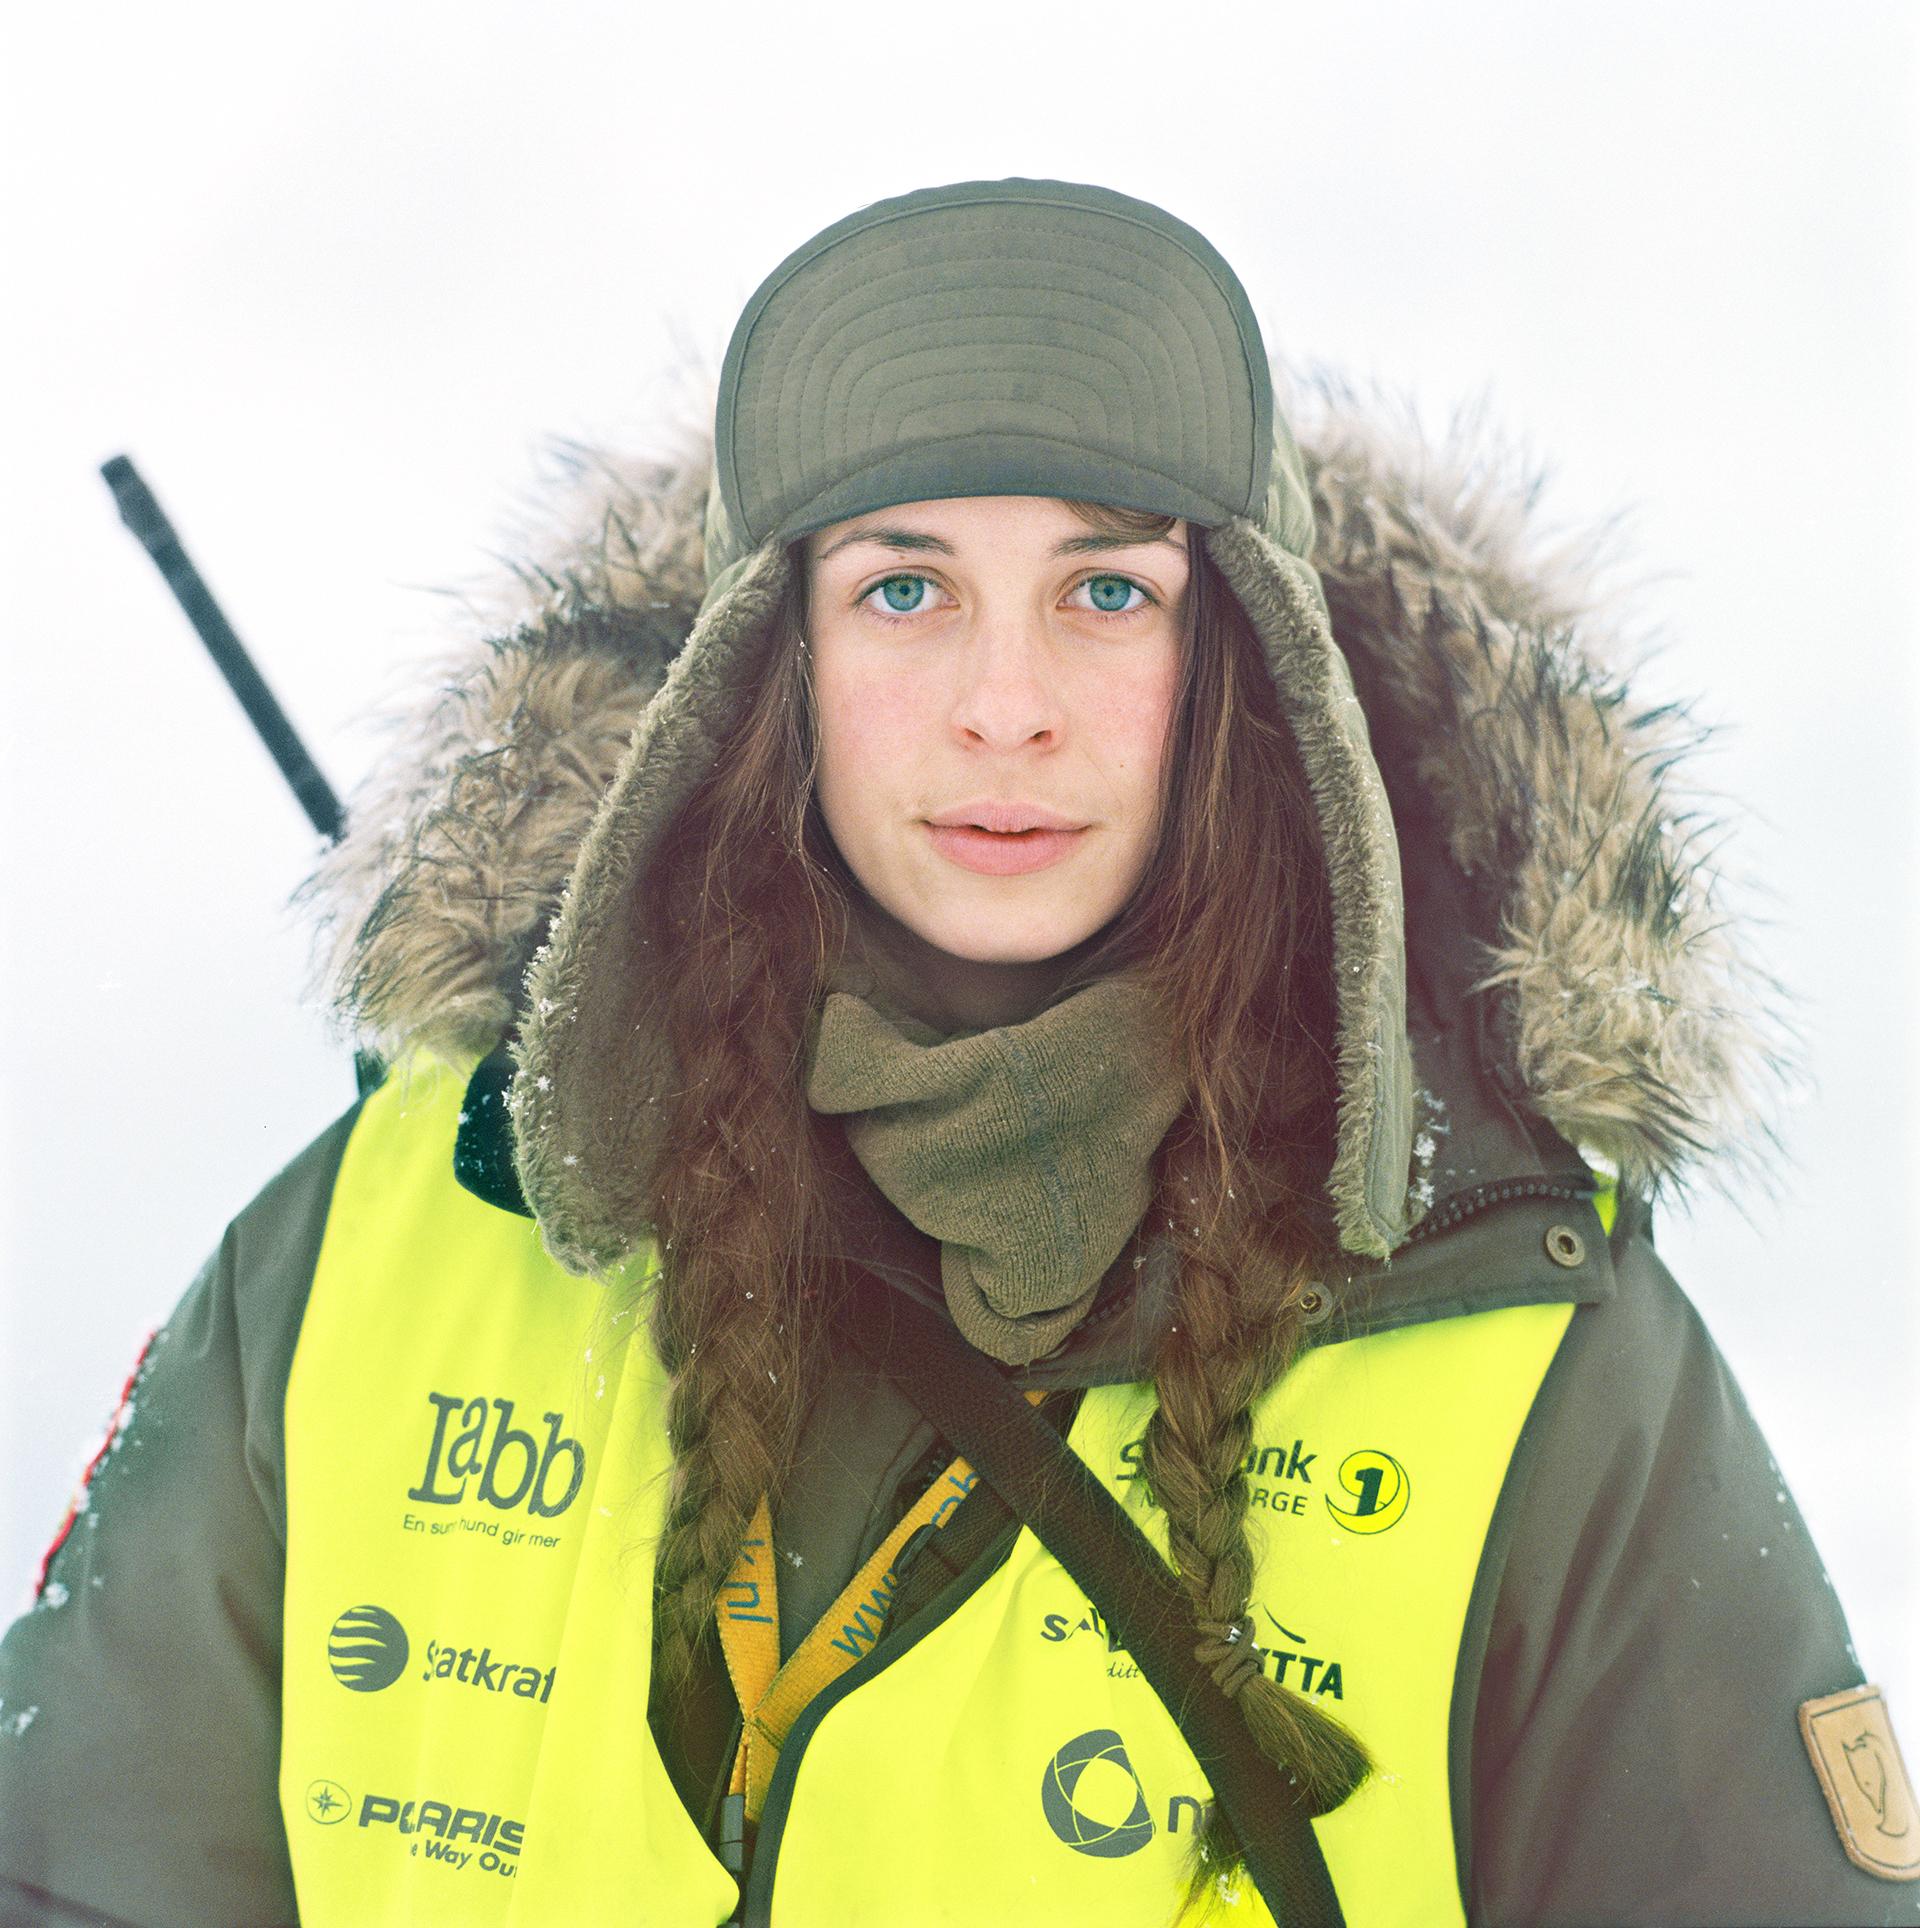 Kristin Jæger Wexsahl, Guide, Arctic Circle Residency . Photograph © Shoshannah White 2015